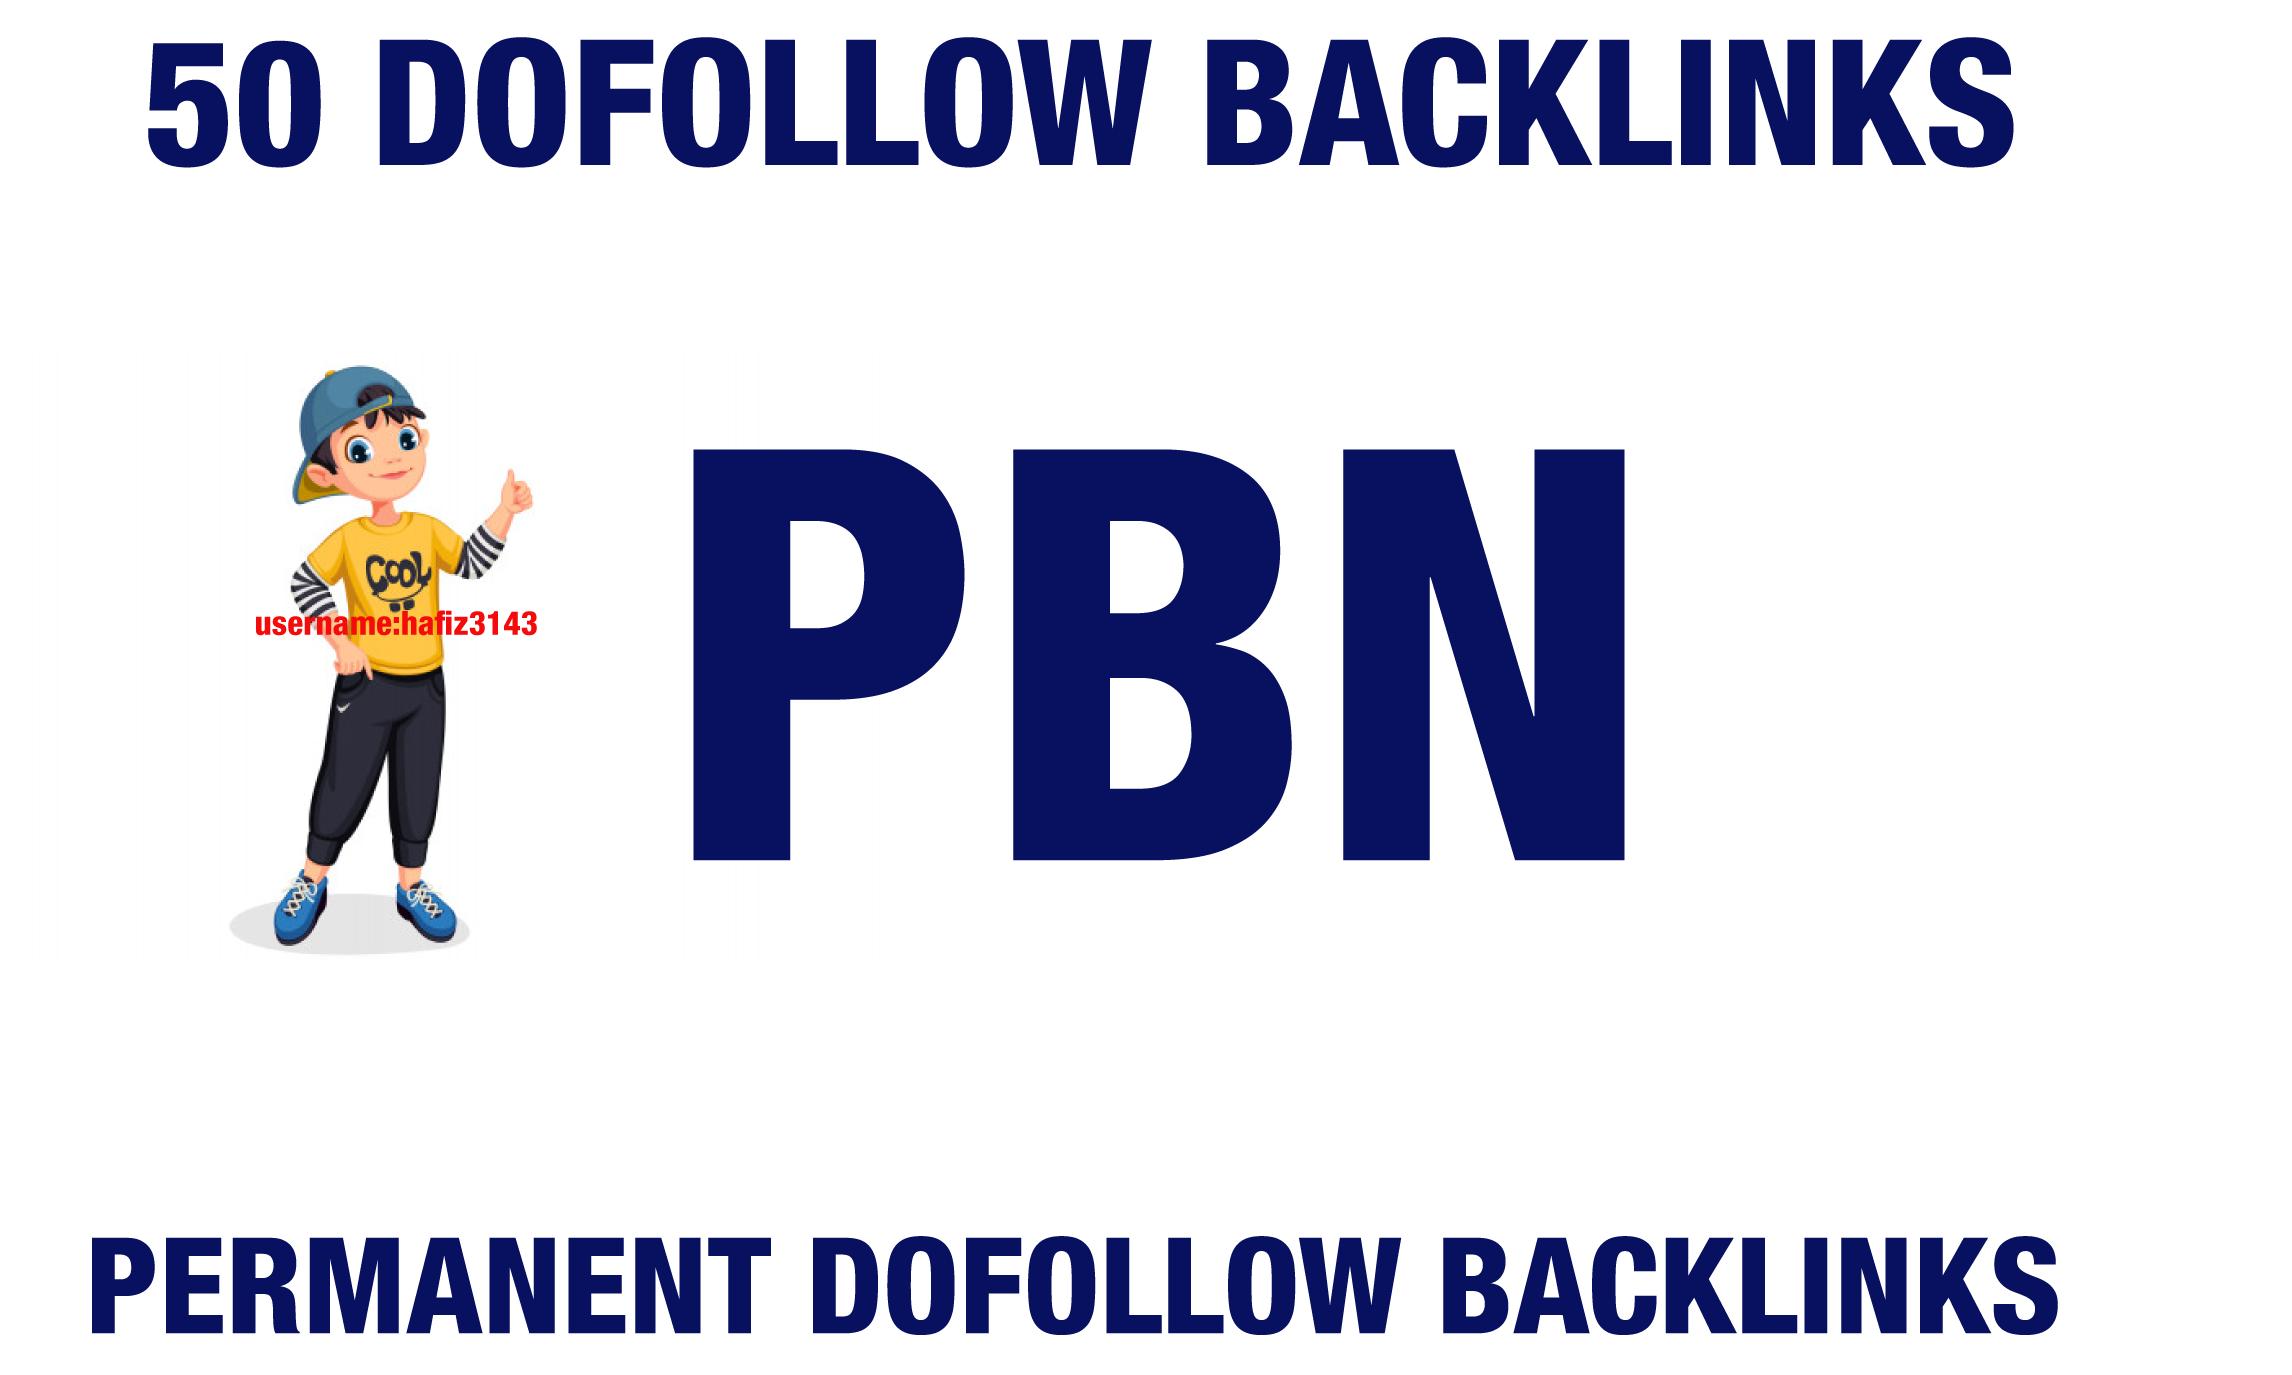 50 Permanent Dofollow PBN Backlinks